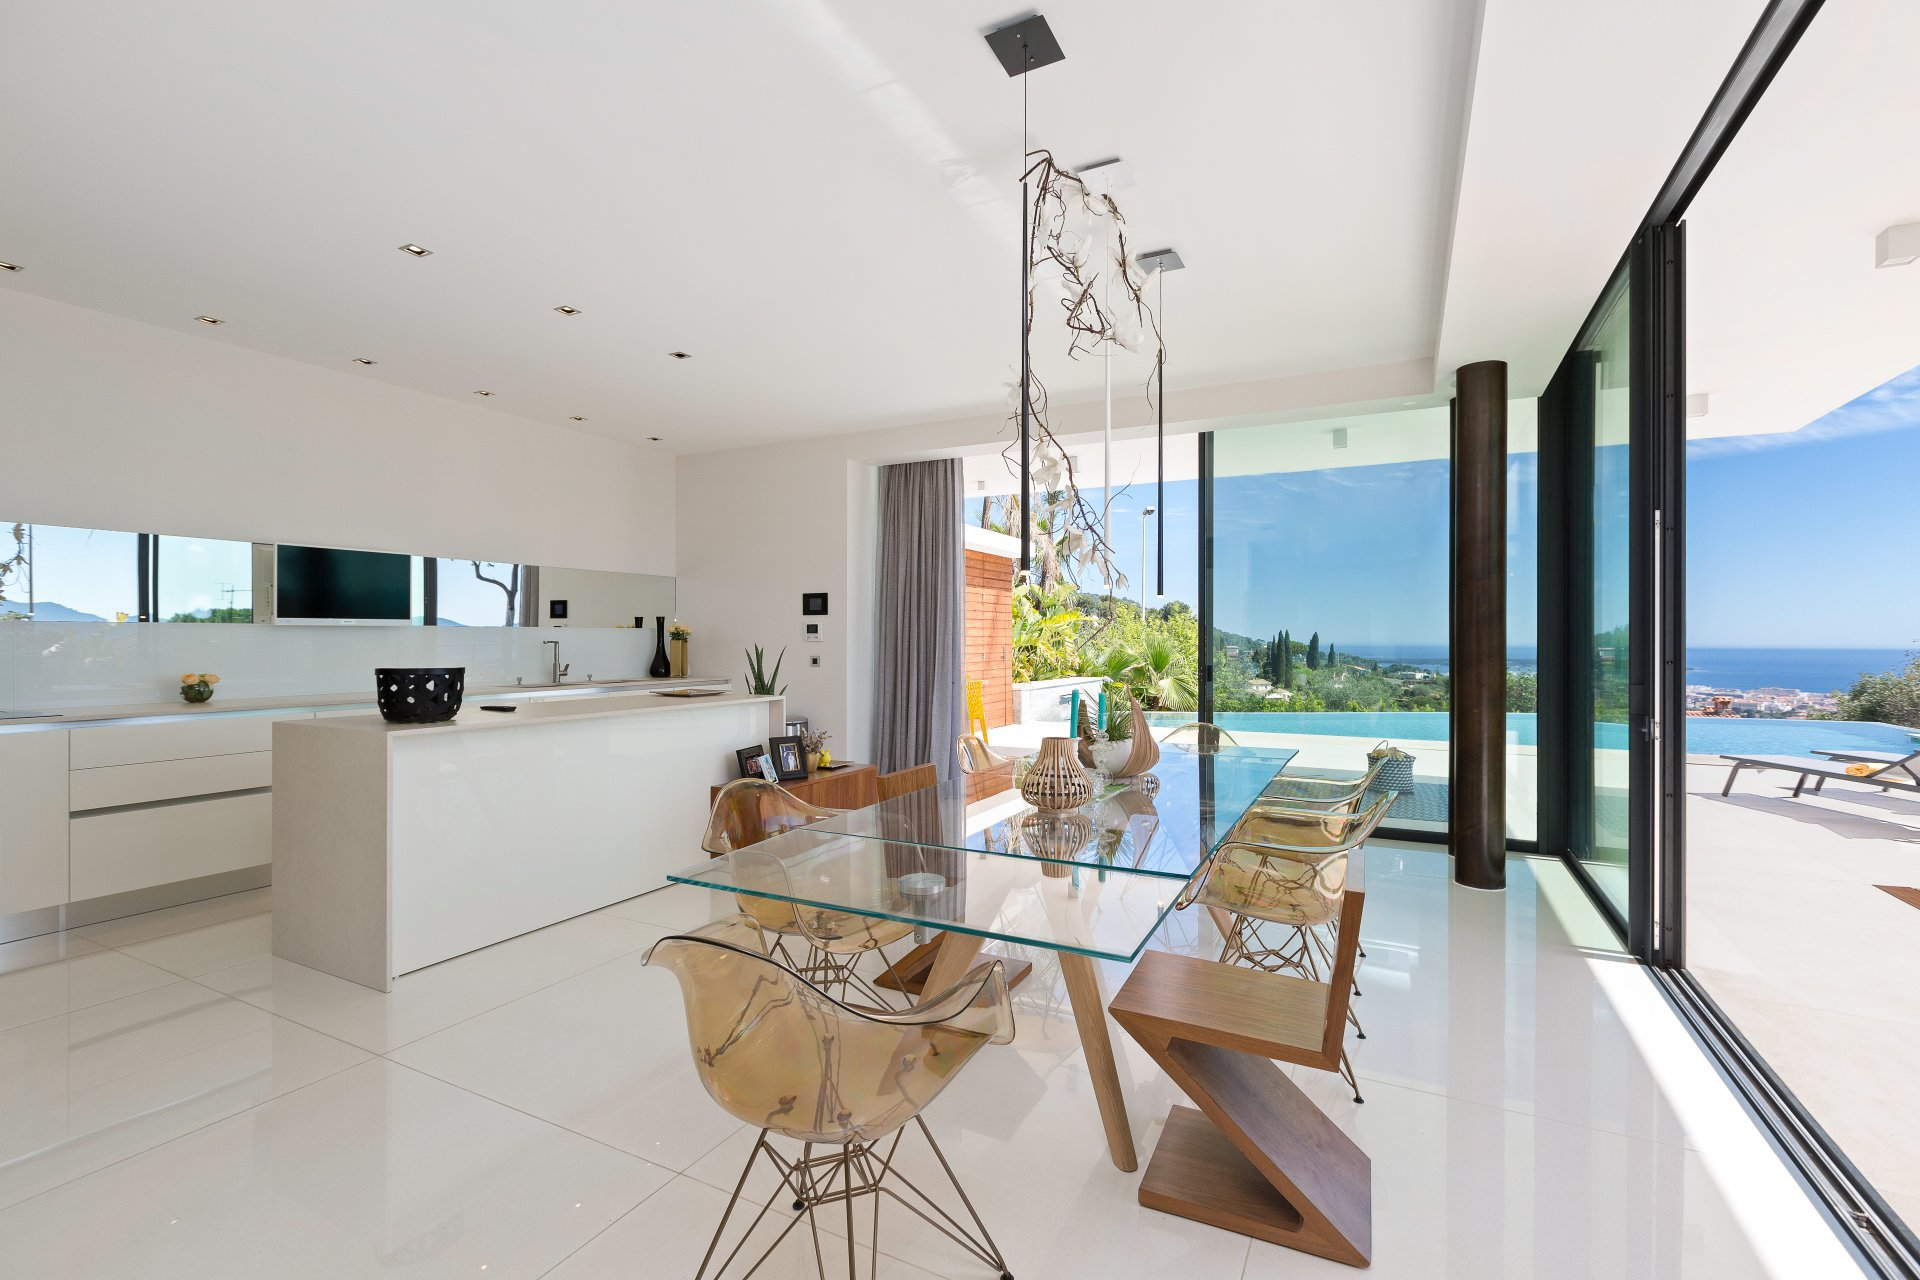 ad sale house le cannet les br gui res 06110 7 rooms ref v5032ca. Black Bedroom Furniture Sets. Home Design Ideas